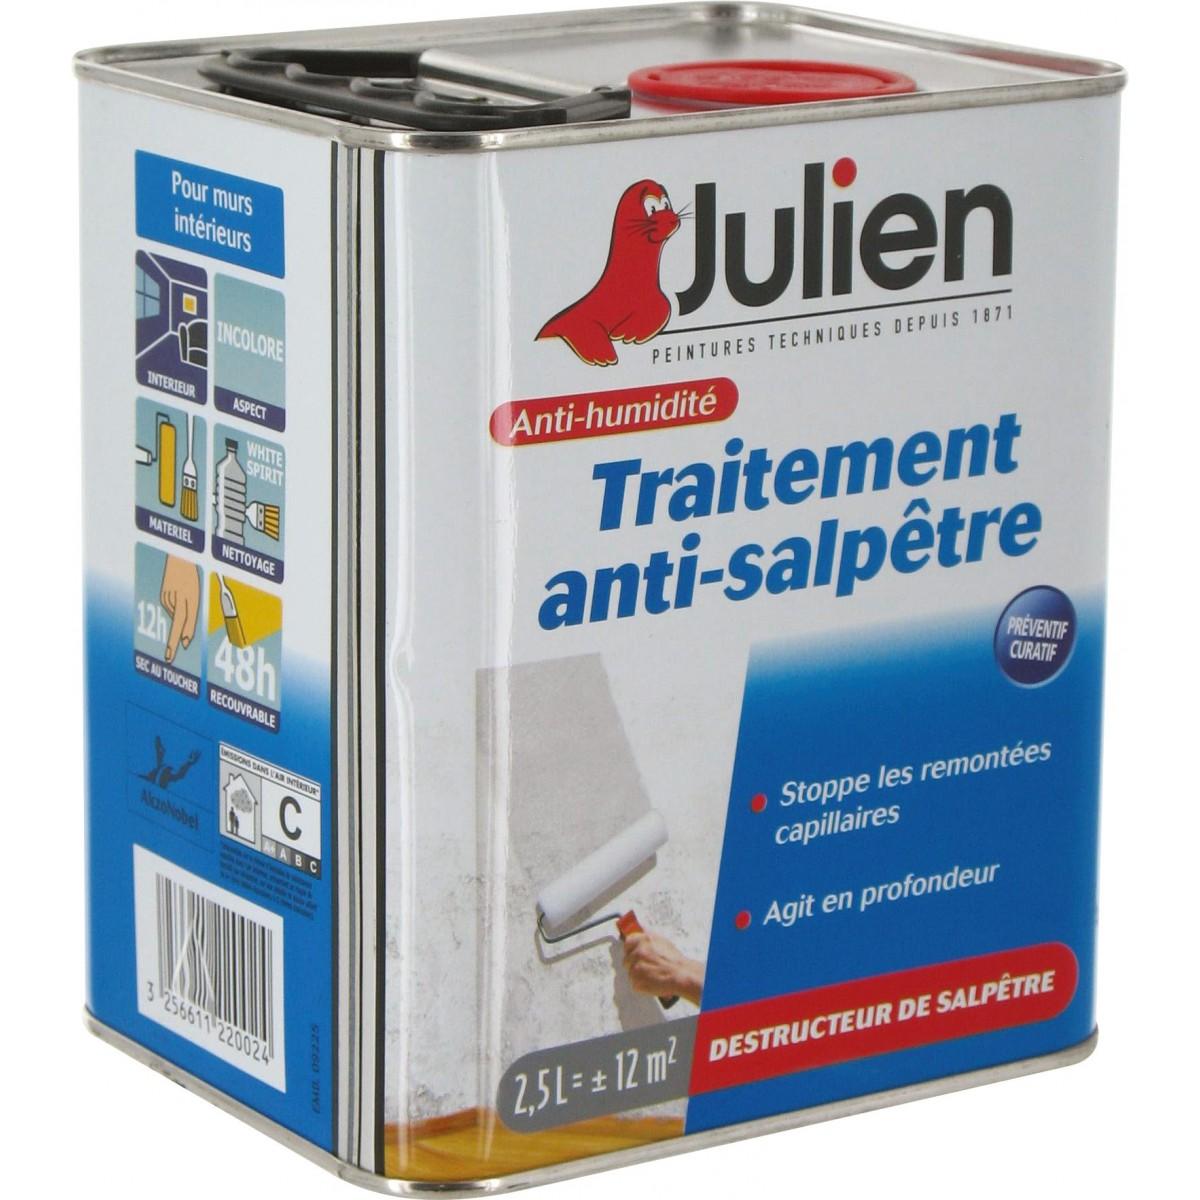 traitement anti salp tre julien bidon 2 5 l de traitement anti salp tre. Black Bedroom Furniture Sets. Home Design Ideas